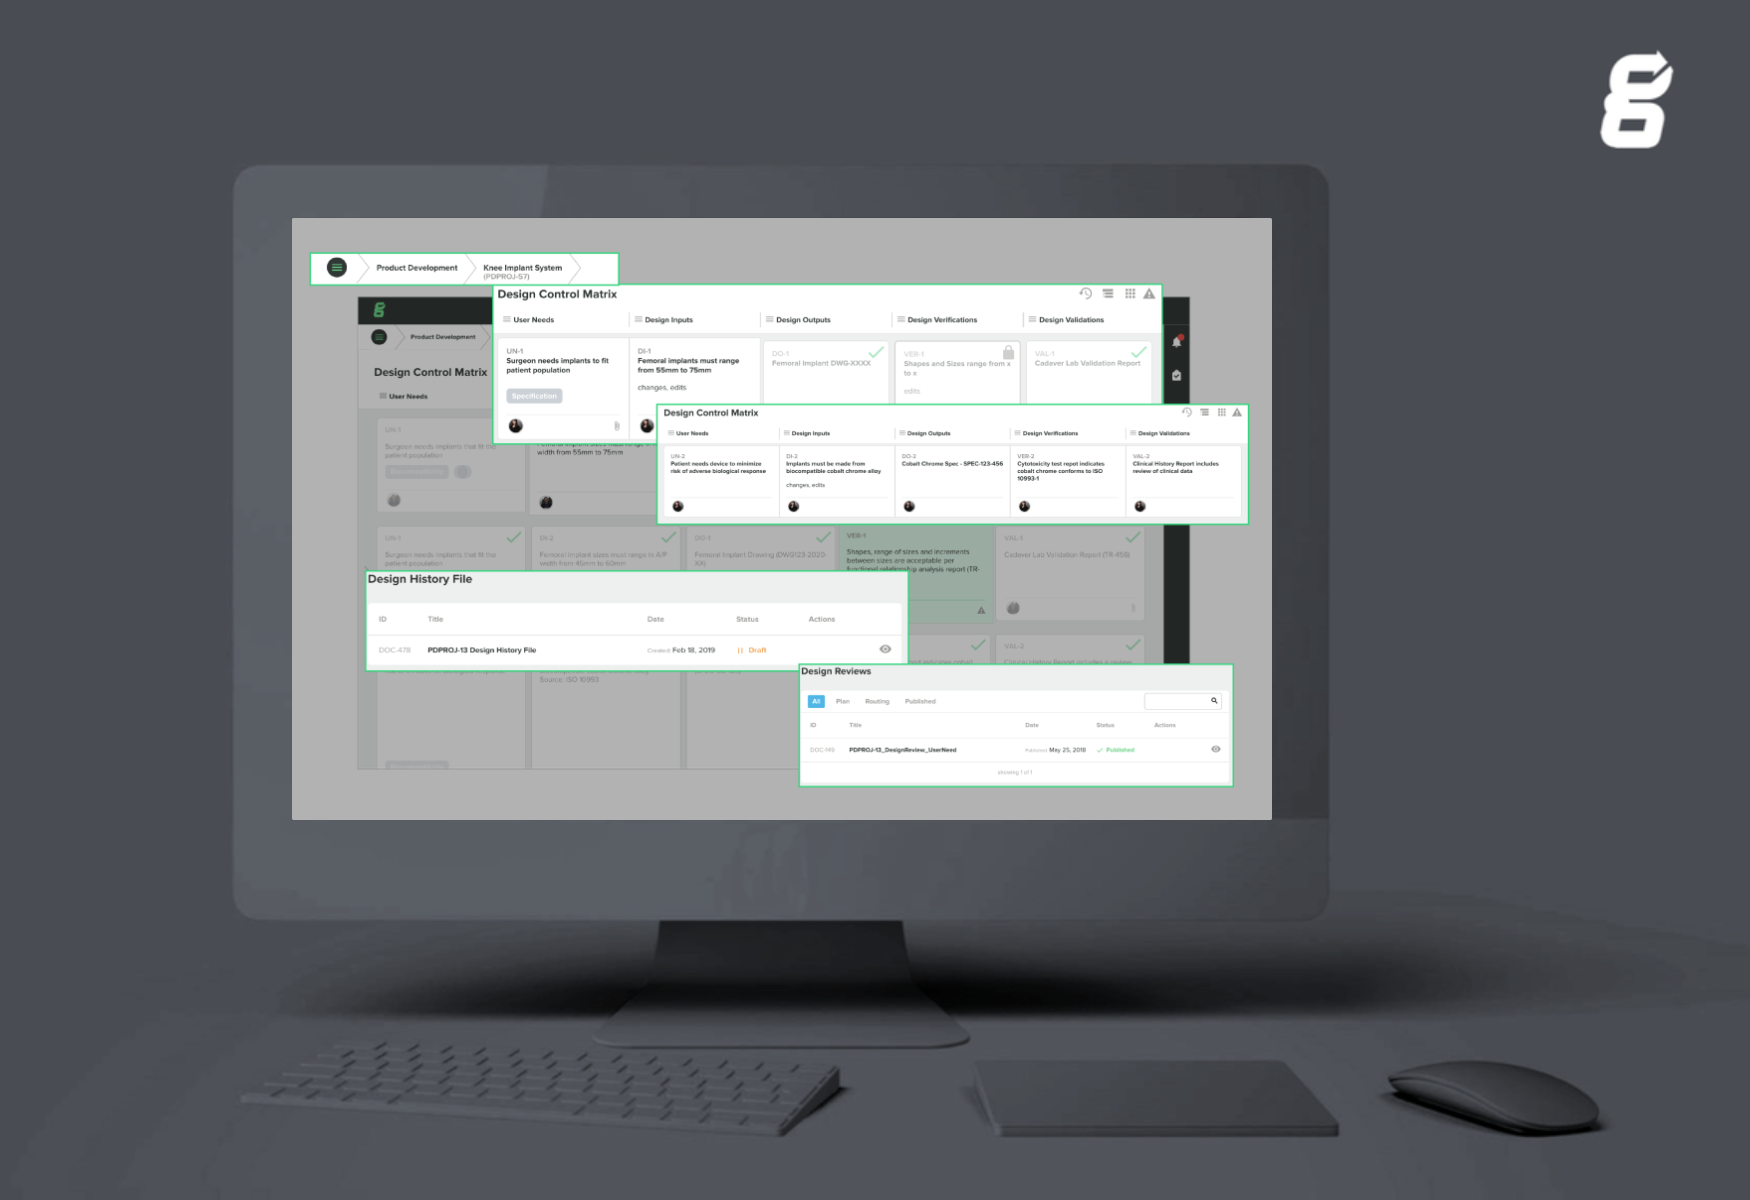 Design control traceability matrix in Greenlight Guru's MDQMS software